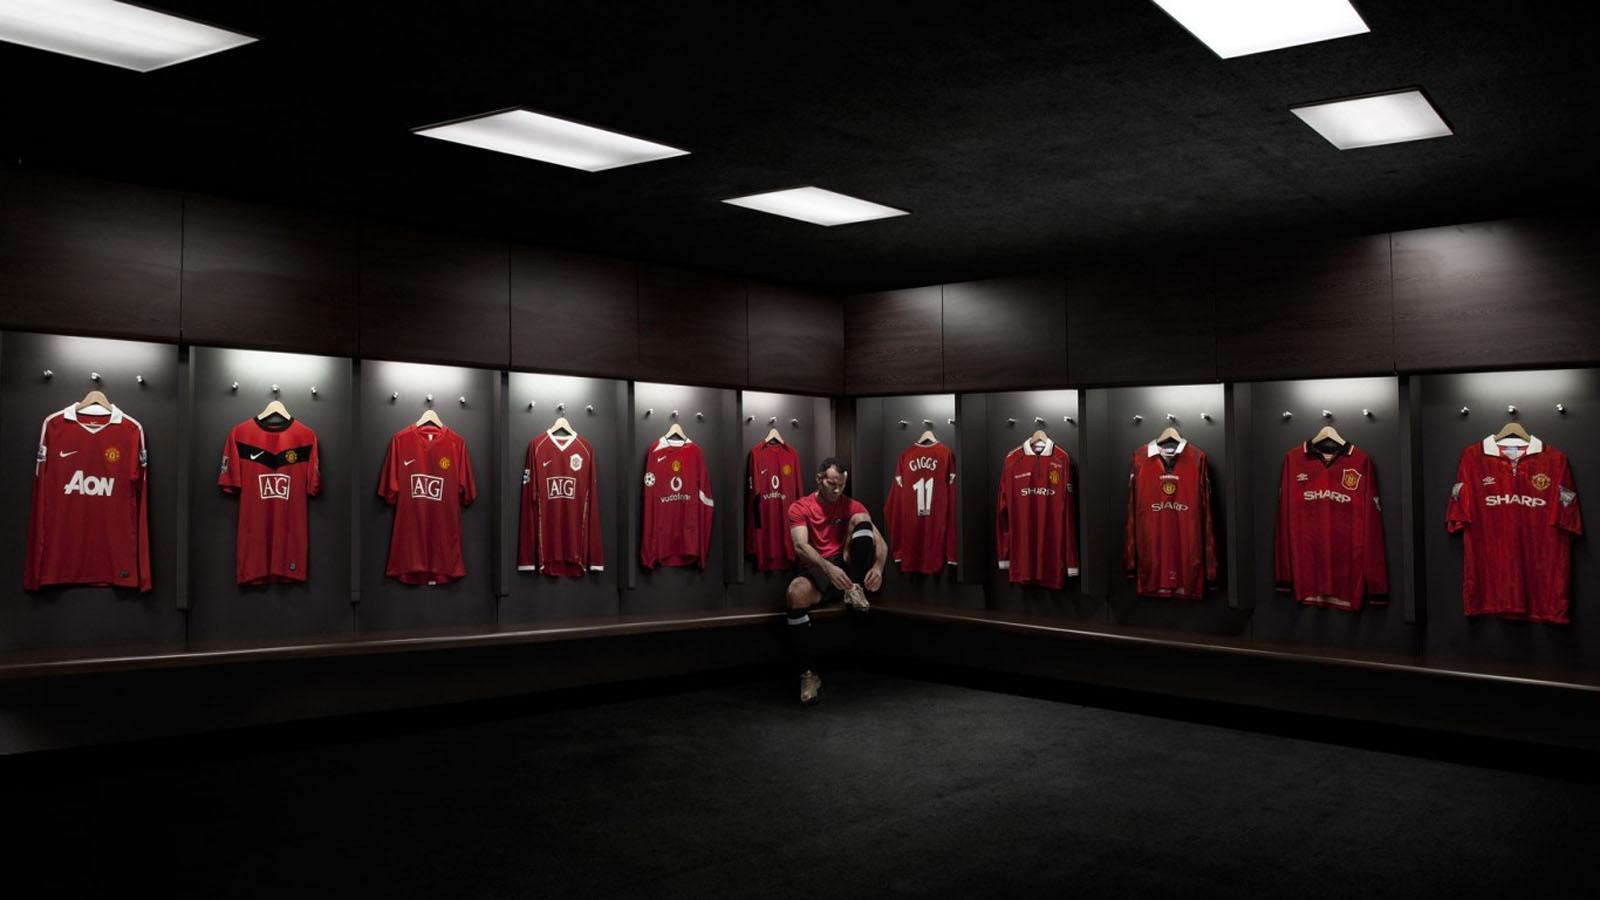 Manchester United pre season schedule in 2014 2015 1600x900